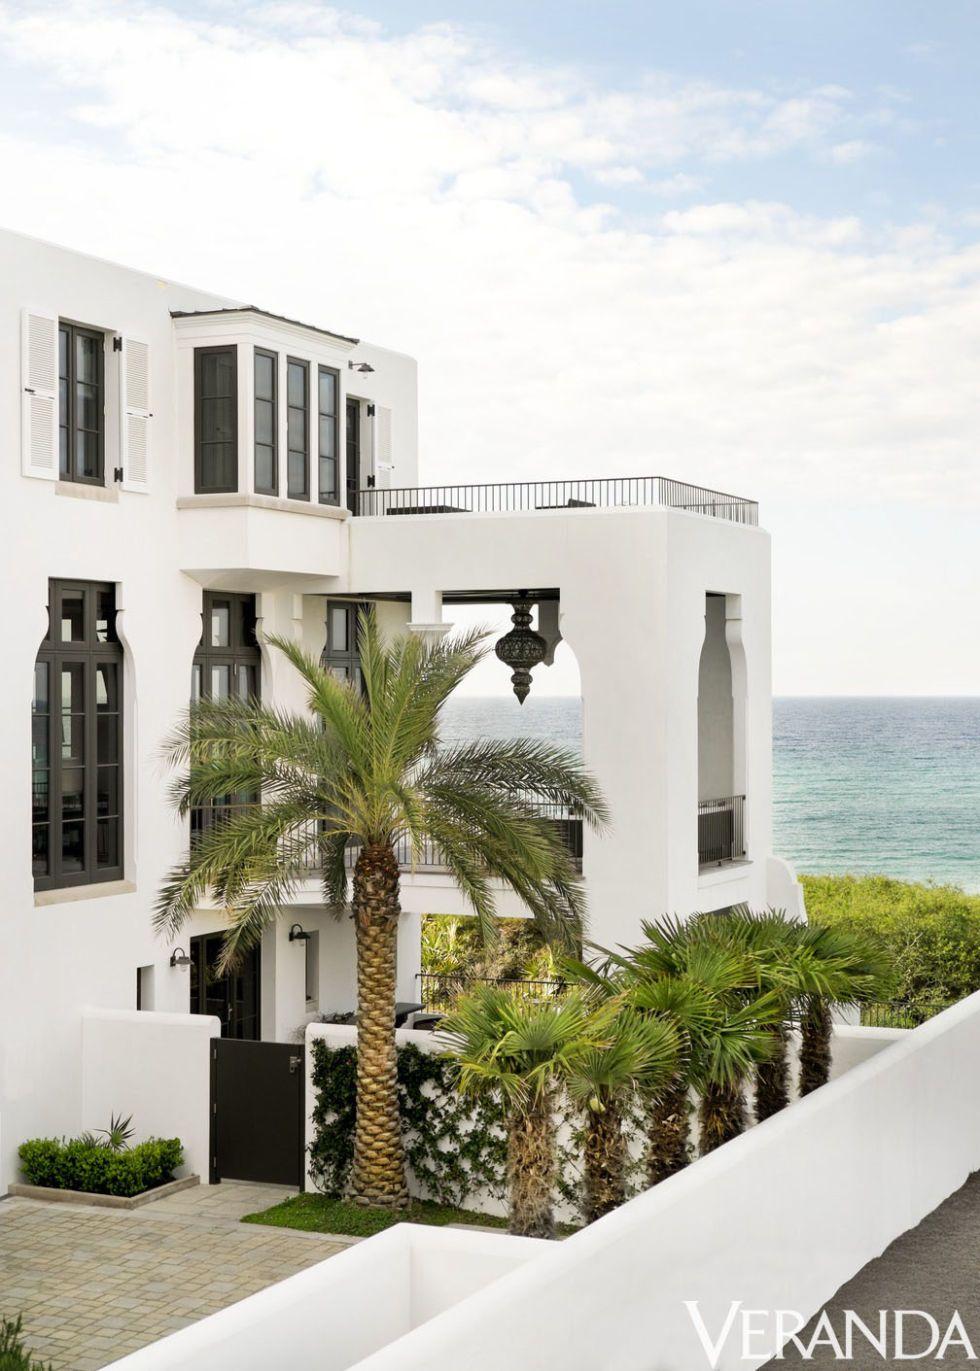 HOUSE TOUR: A Florida Beach House Gets Glammed Up